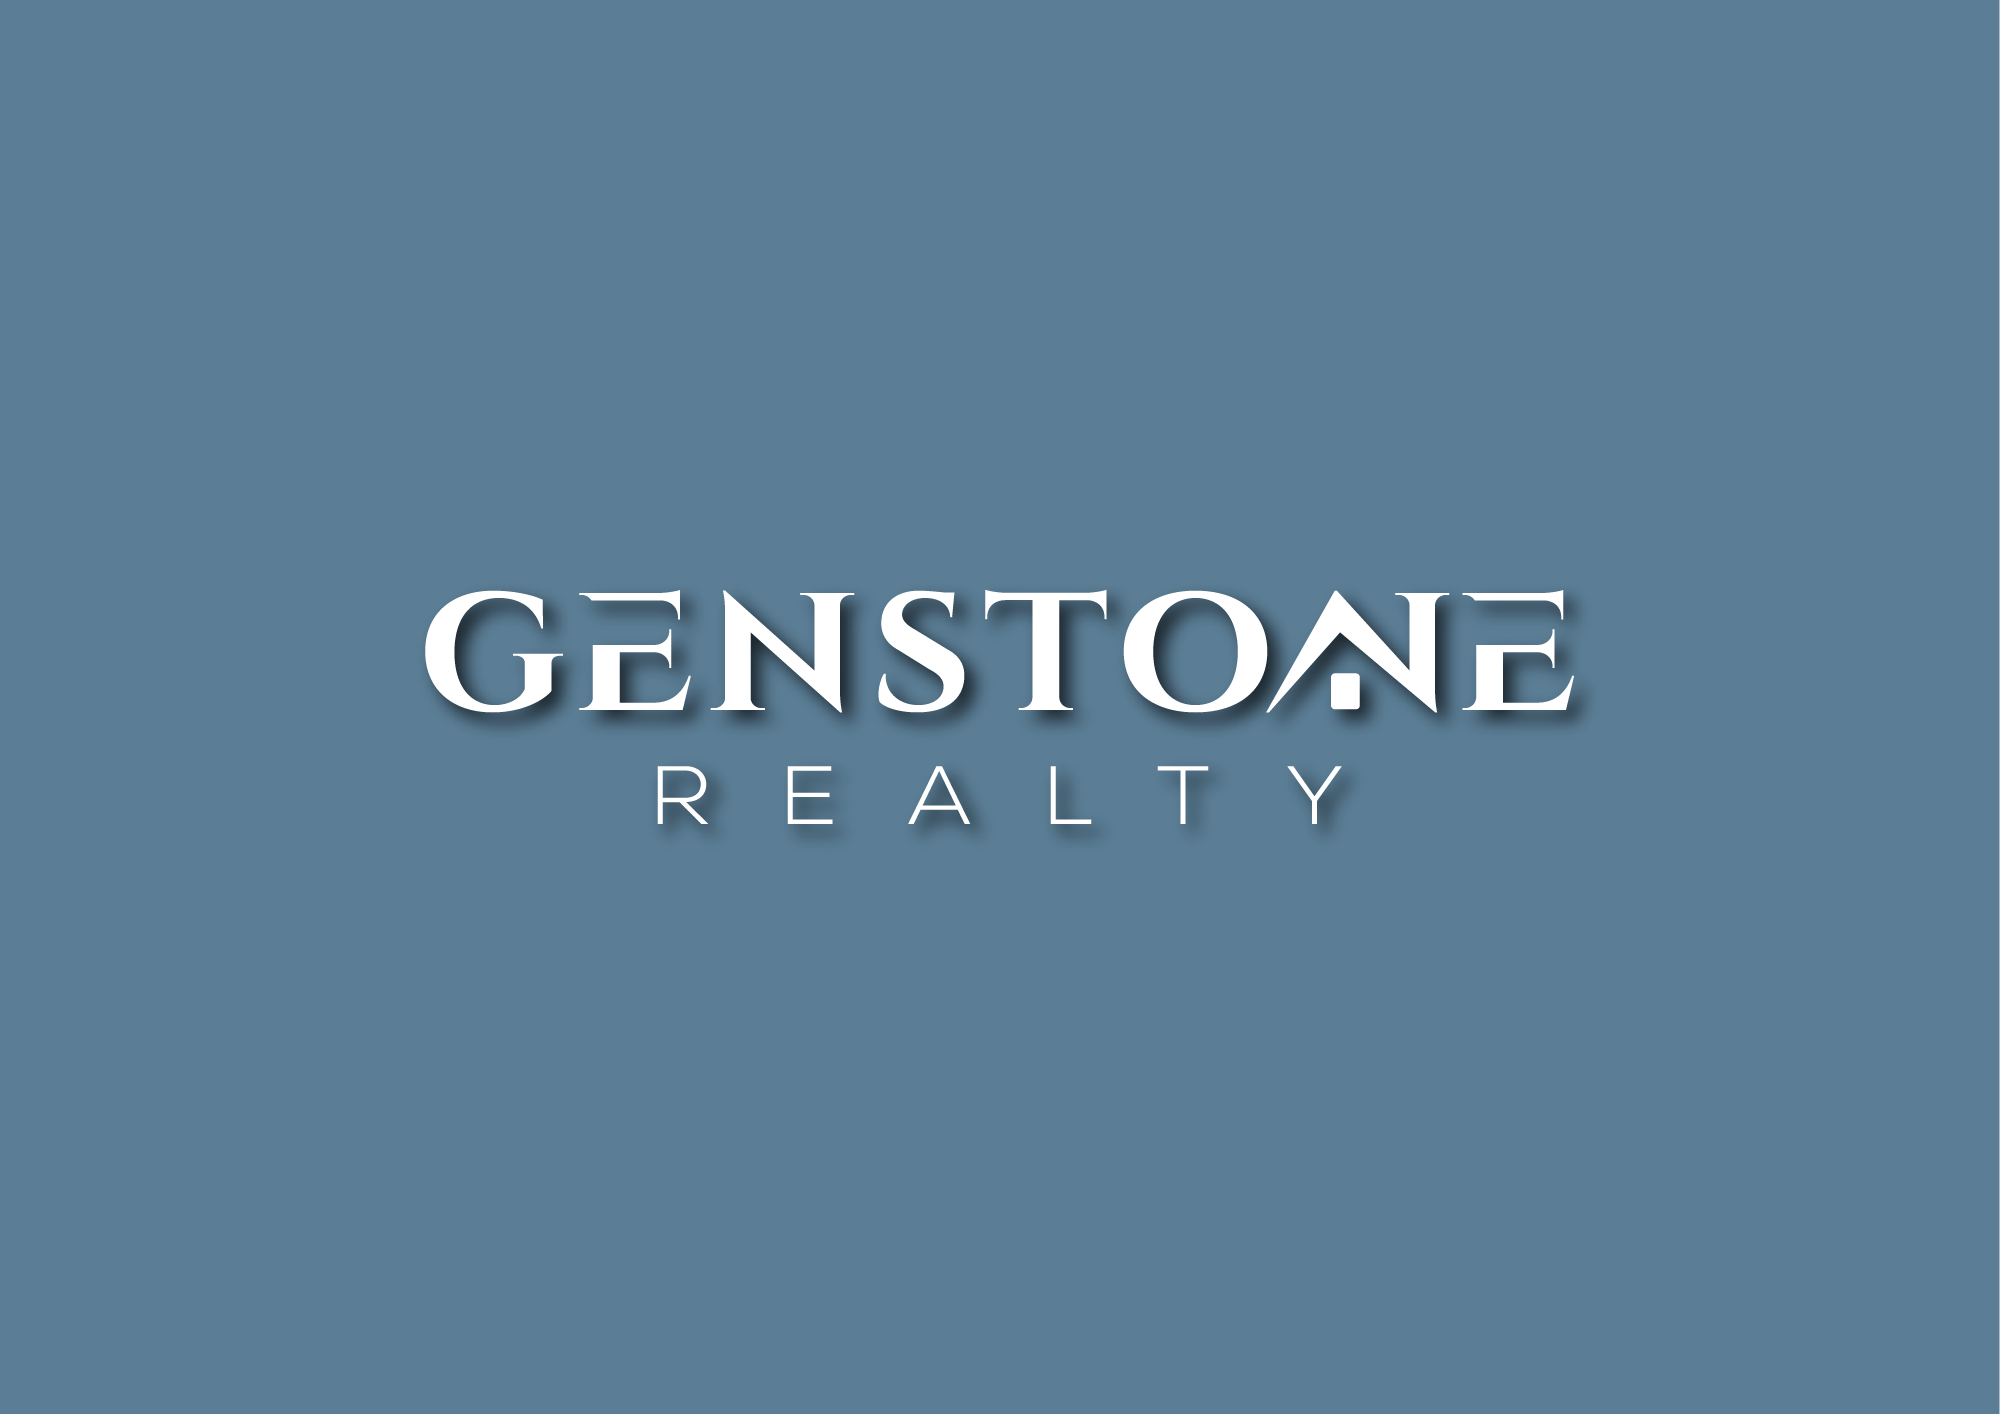 GenStone Realty logo